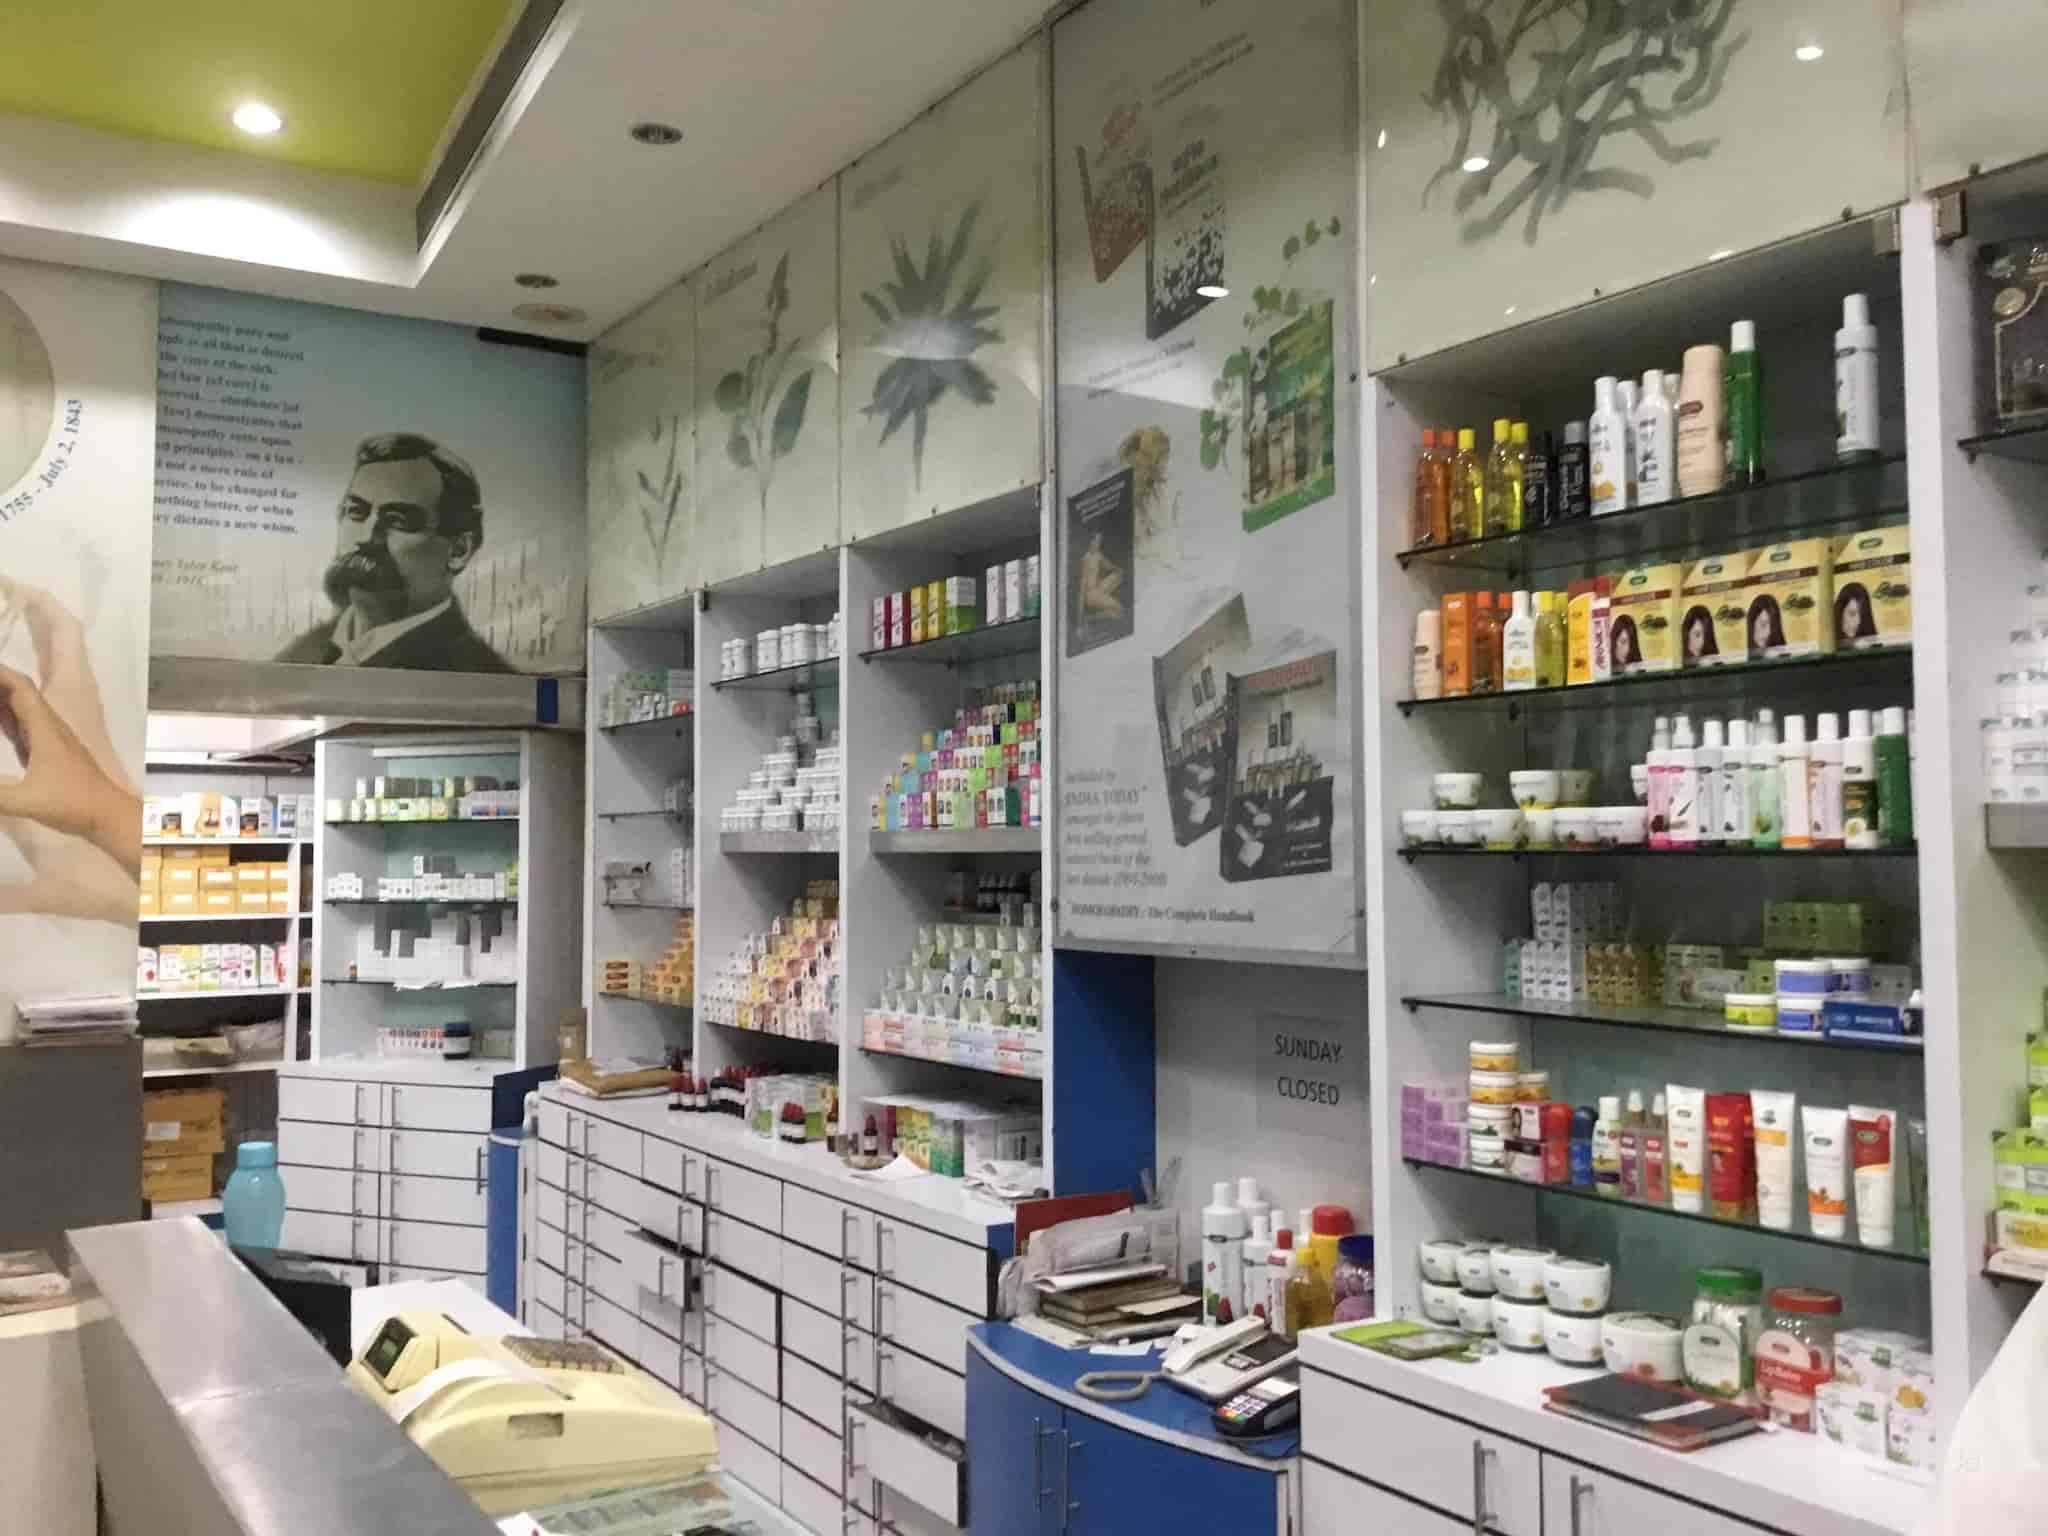 Pratap Homoeo Pharmacy And Clinic Pvt Ltd, Kotla Mubarakpur